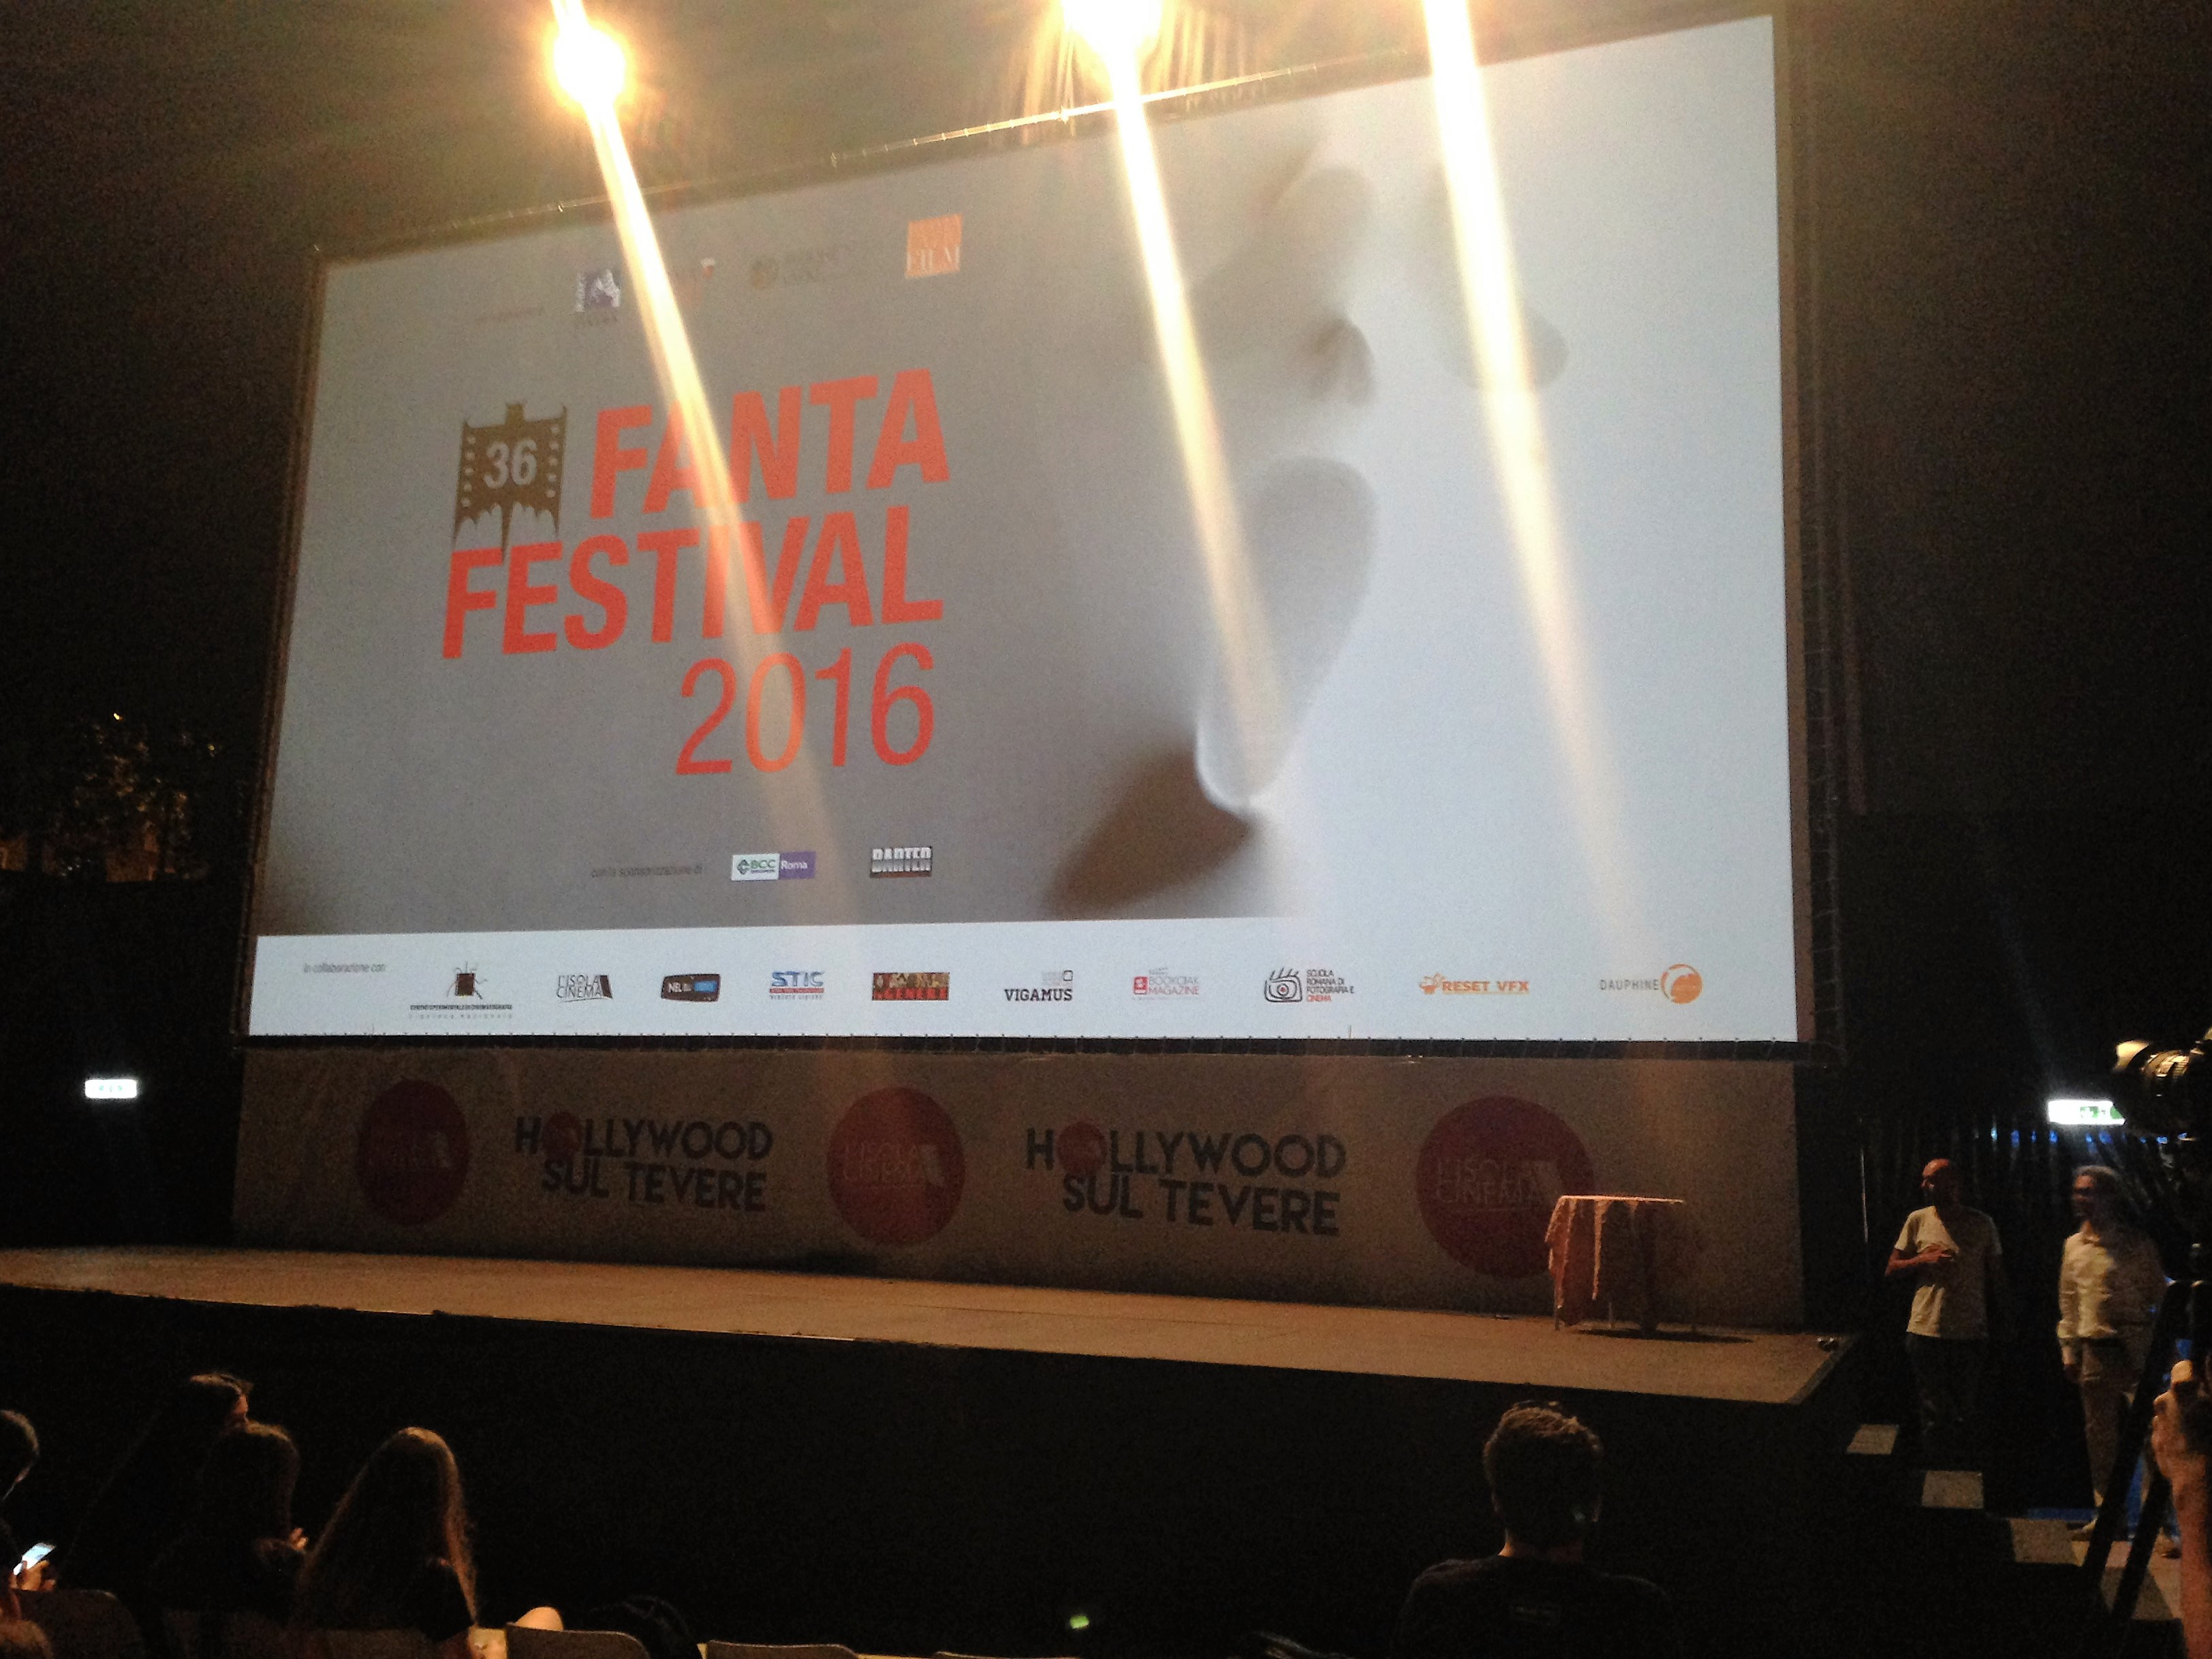 Varicella vince visioni italiane 2016 rb casting - Varicella bagno ...